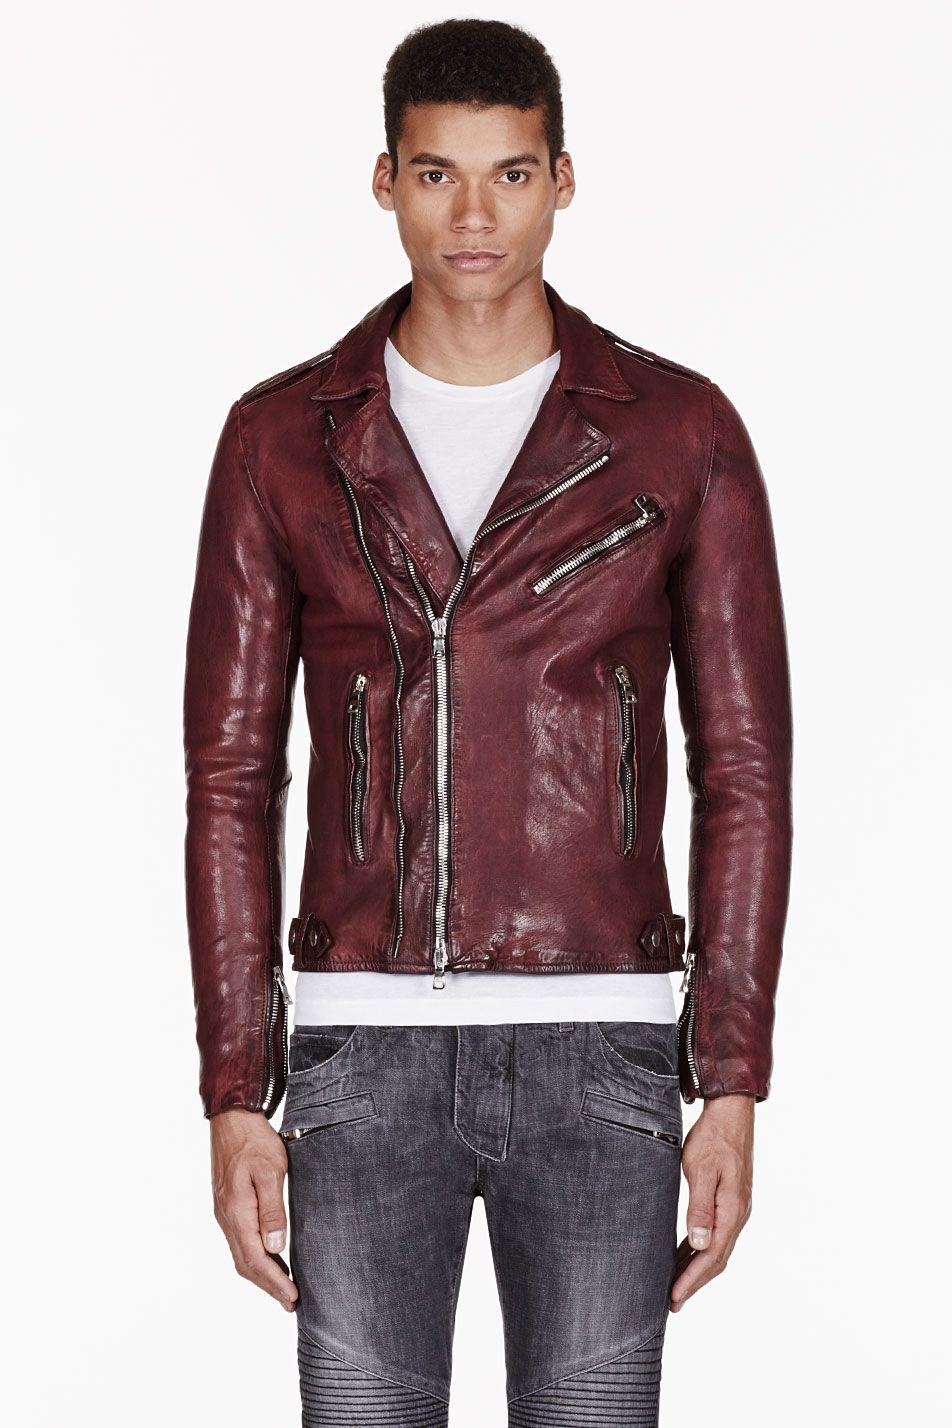 World Of Leather Mens Lambskin Biker Leather Jacket Moto Burgundy